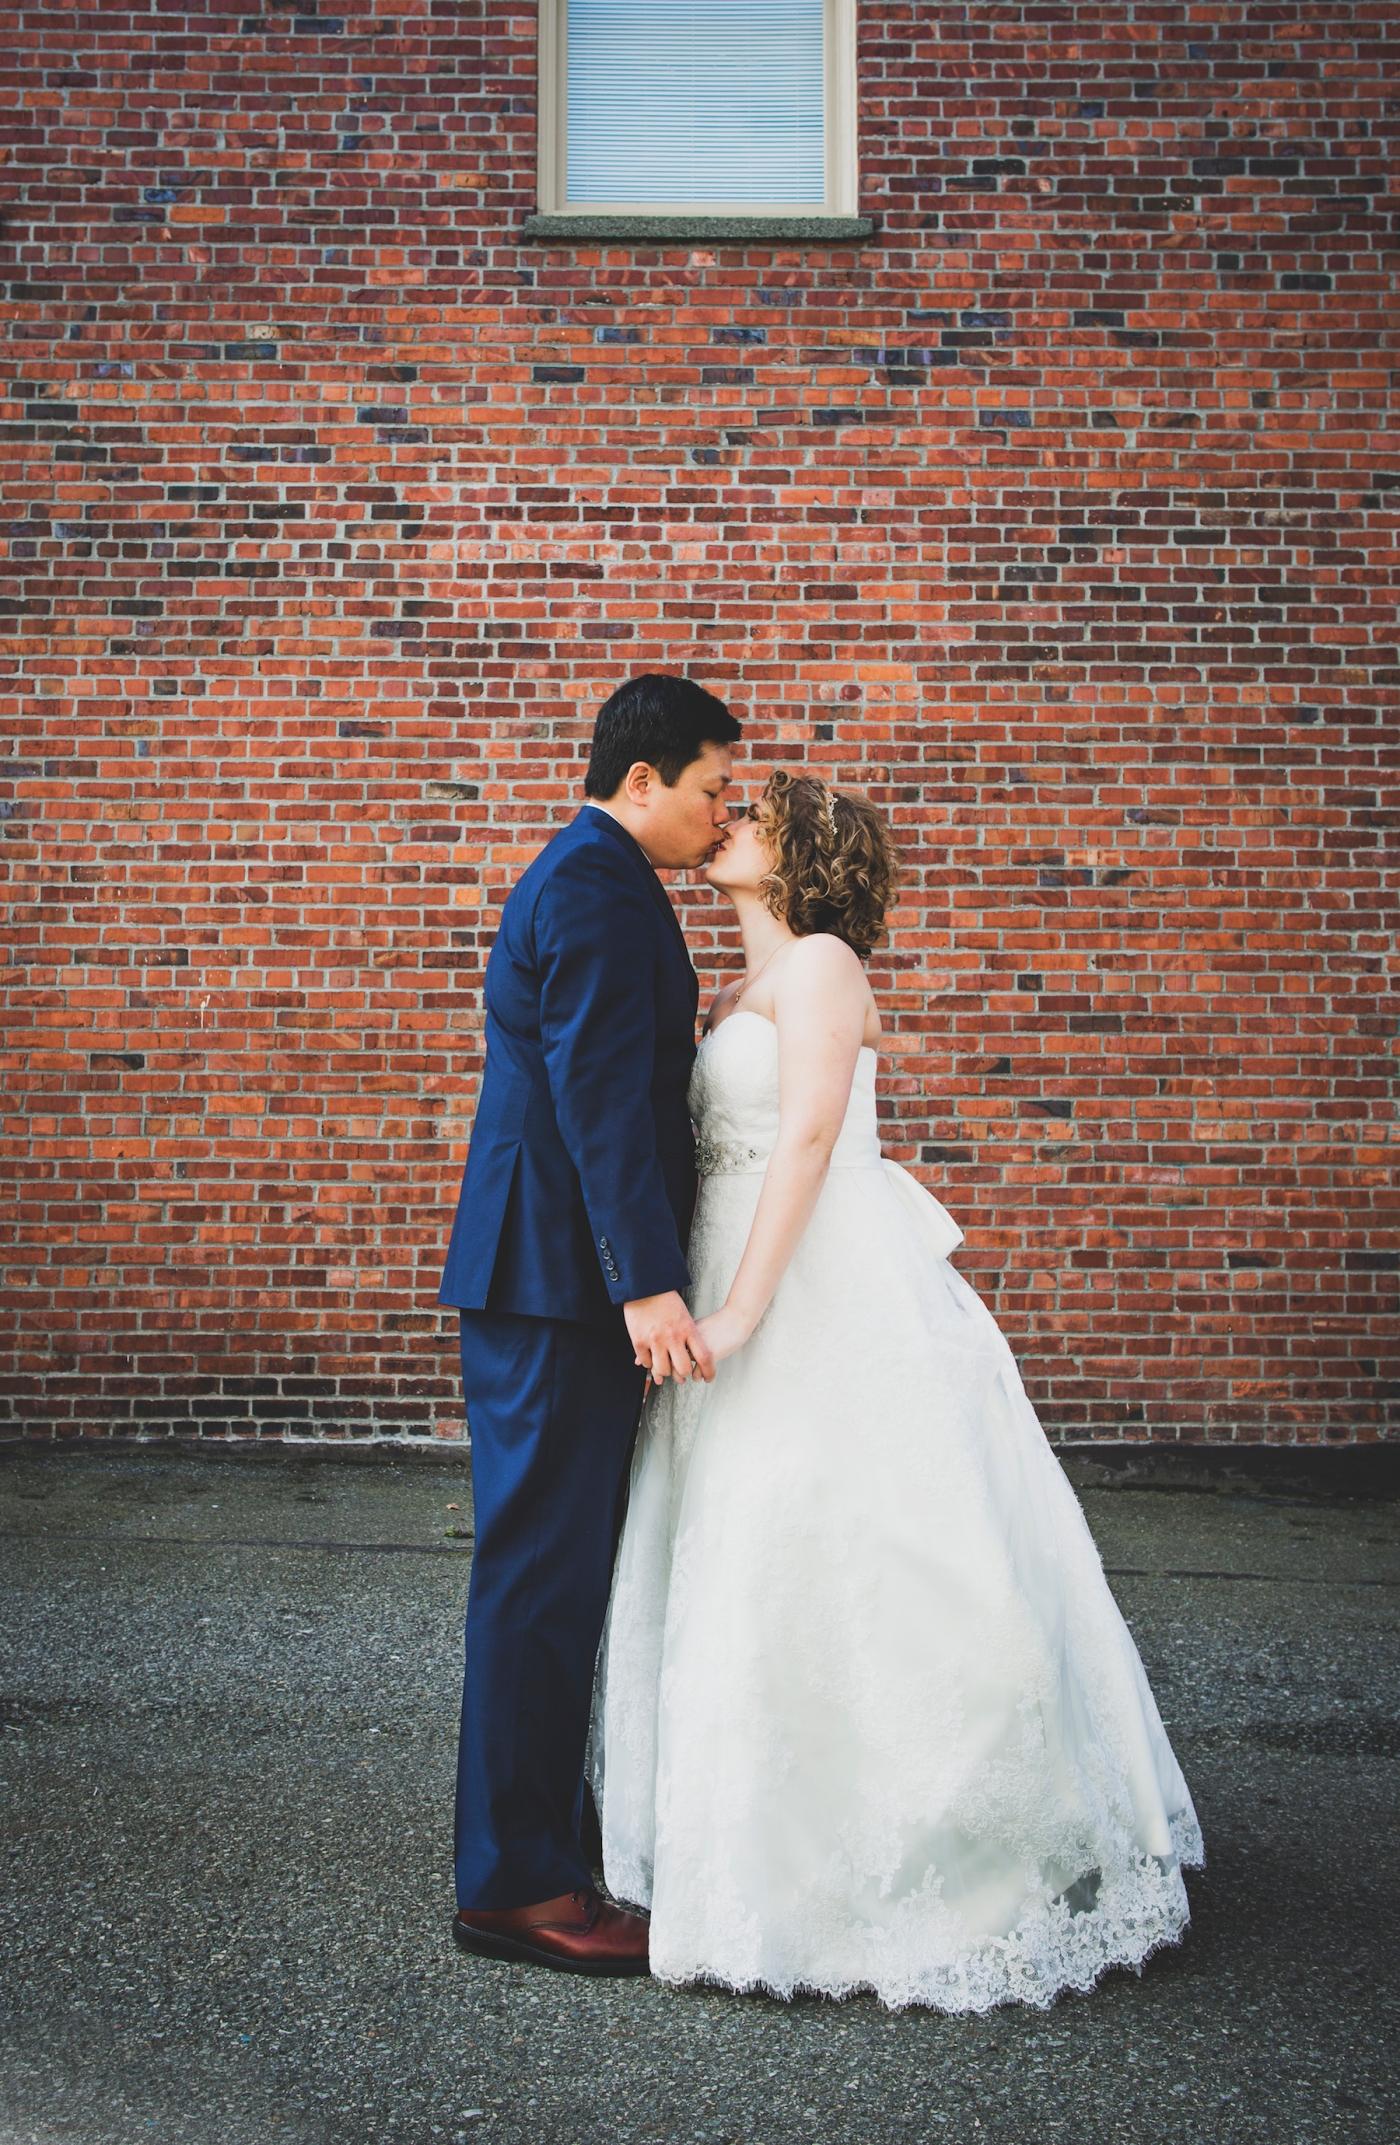 DSC_2147Everett_Wedding_Ballroom_Jane_Speleers_photography_Rachel_and_Edmund_Bridesmaids_peach_dresses_groomsmen_2017